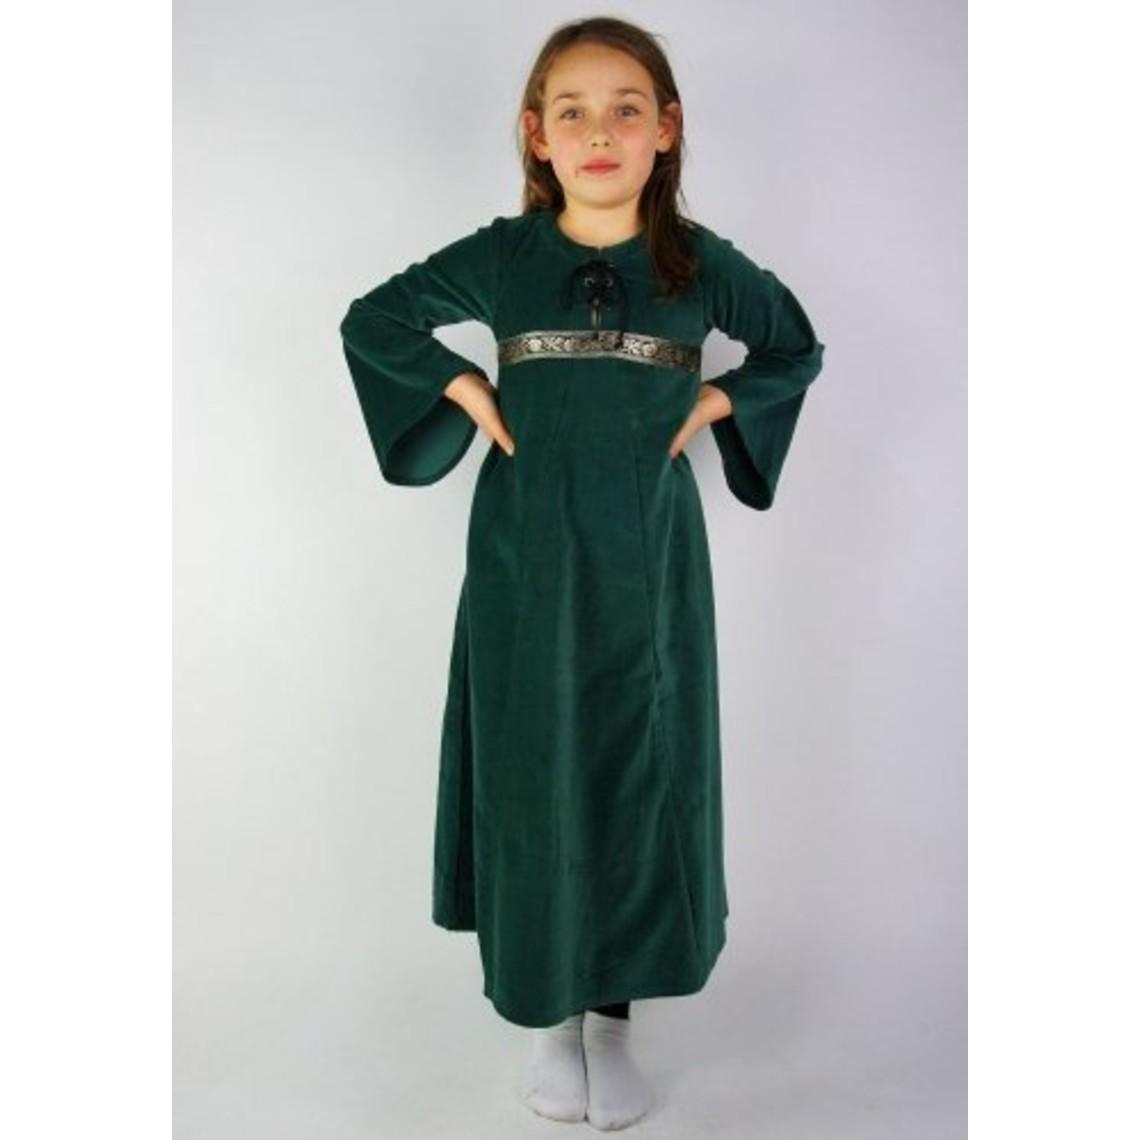 Leonardo Carbone Vestido de chica de terciopelo Ariane, verde